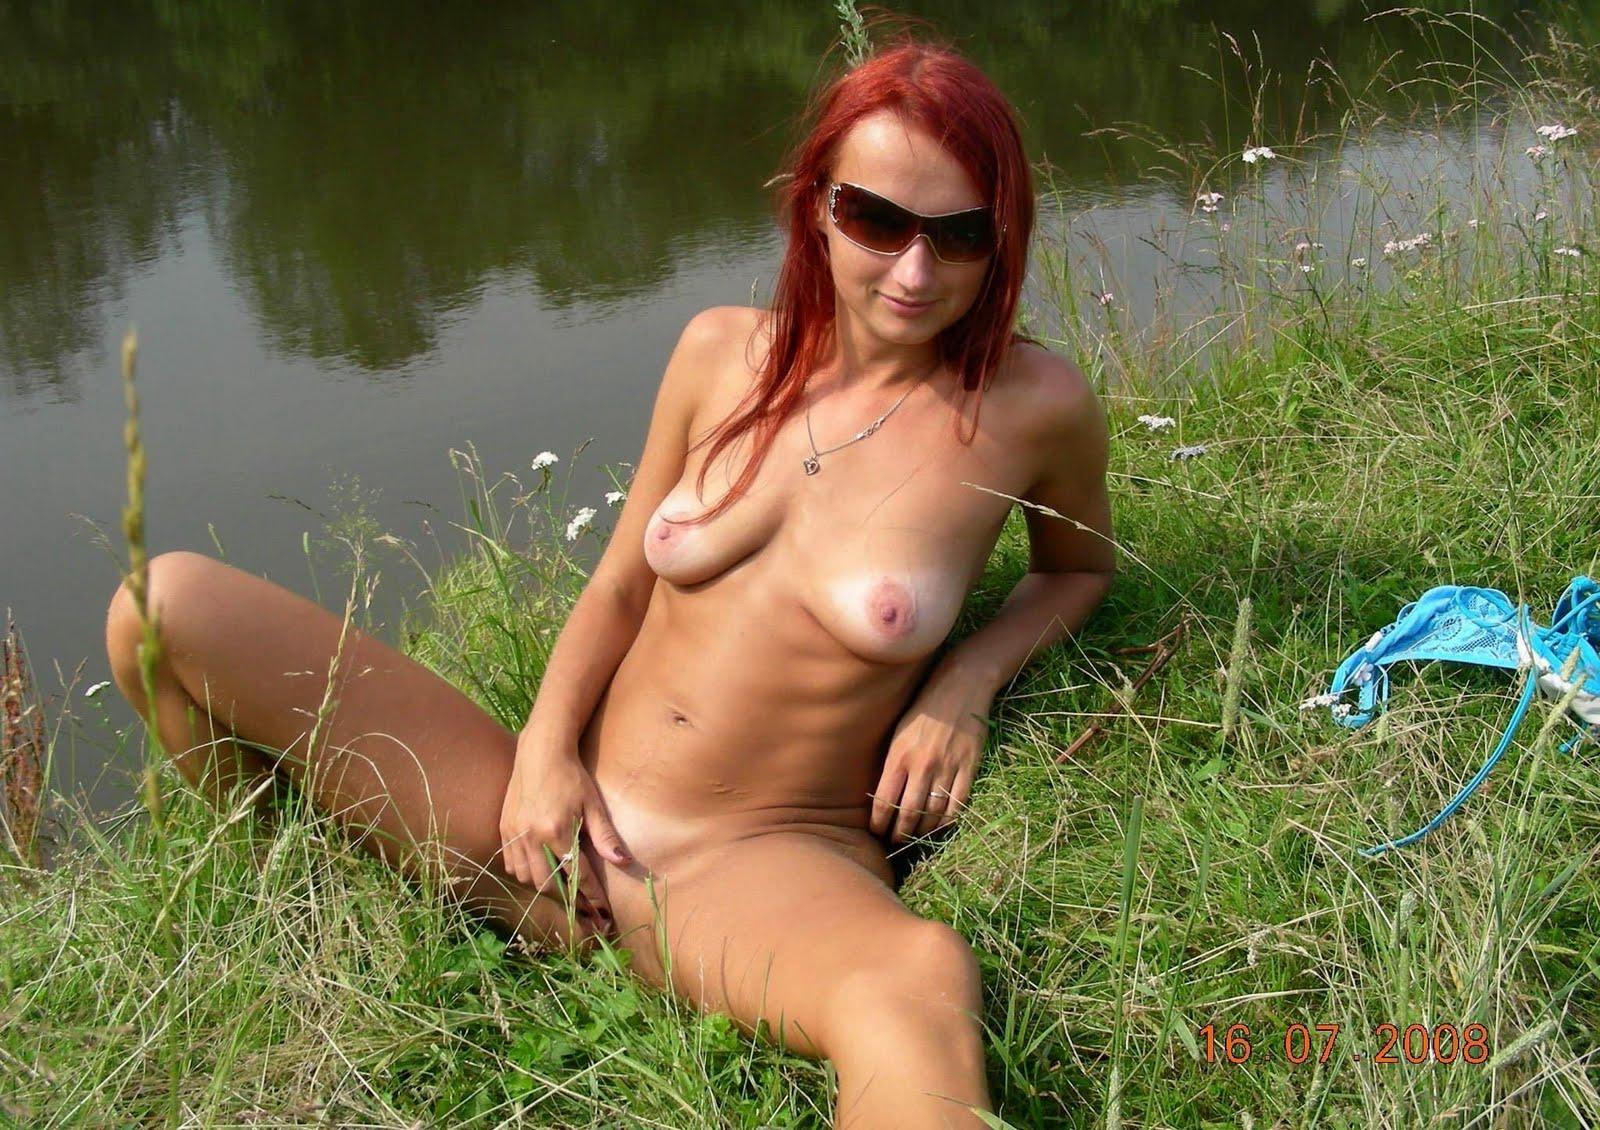 Я и моя голая жена на природе, Жену на природе -видео. Смотреть жену на природе 23 фотография